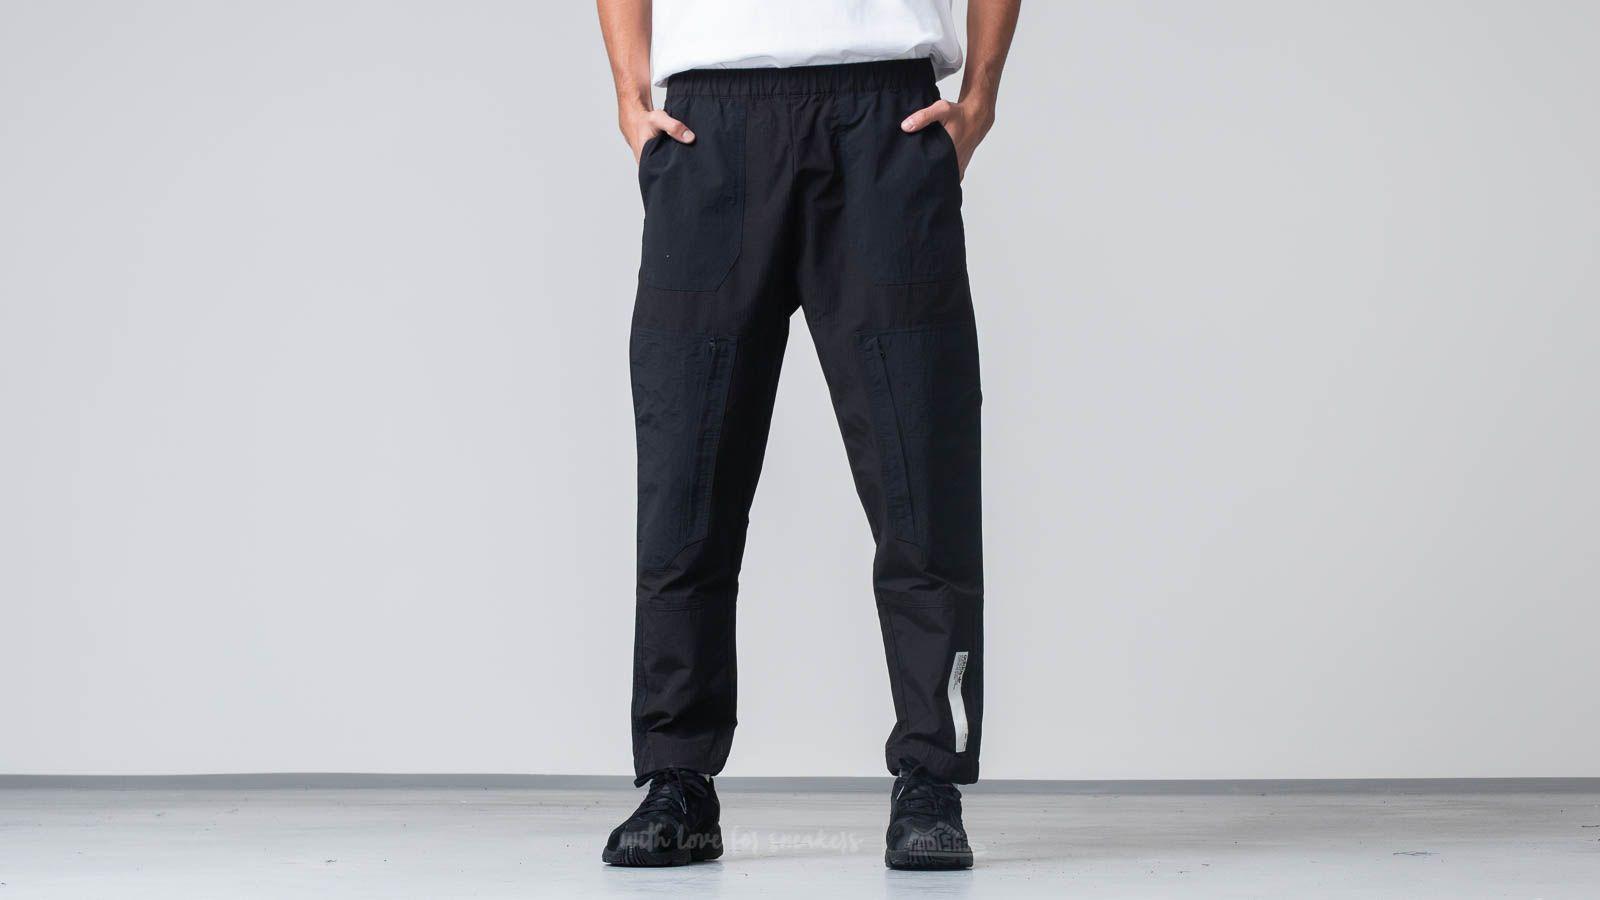 11b9afc7f21b adidas NMD Trackpants Black at a great price 90 € buy at Footshop